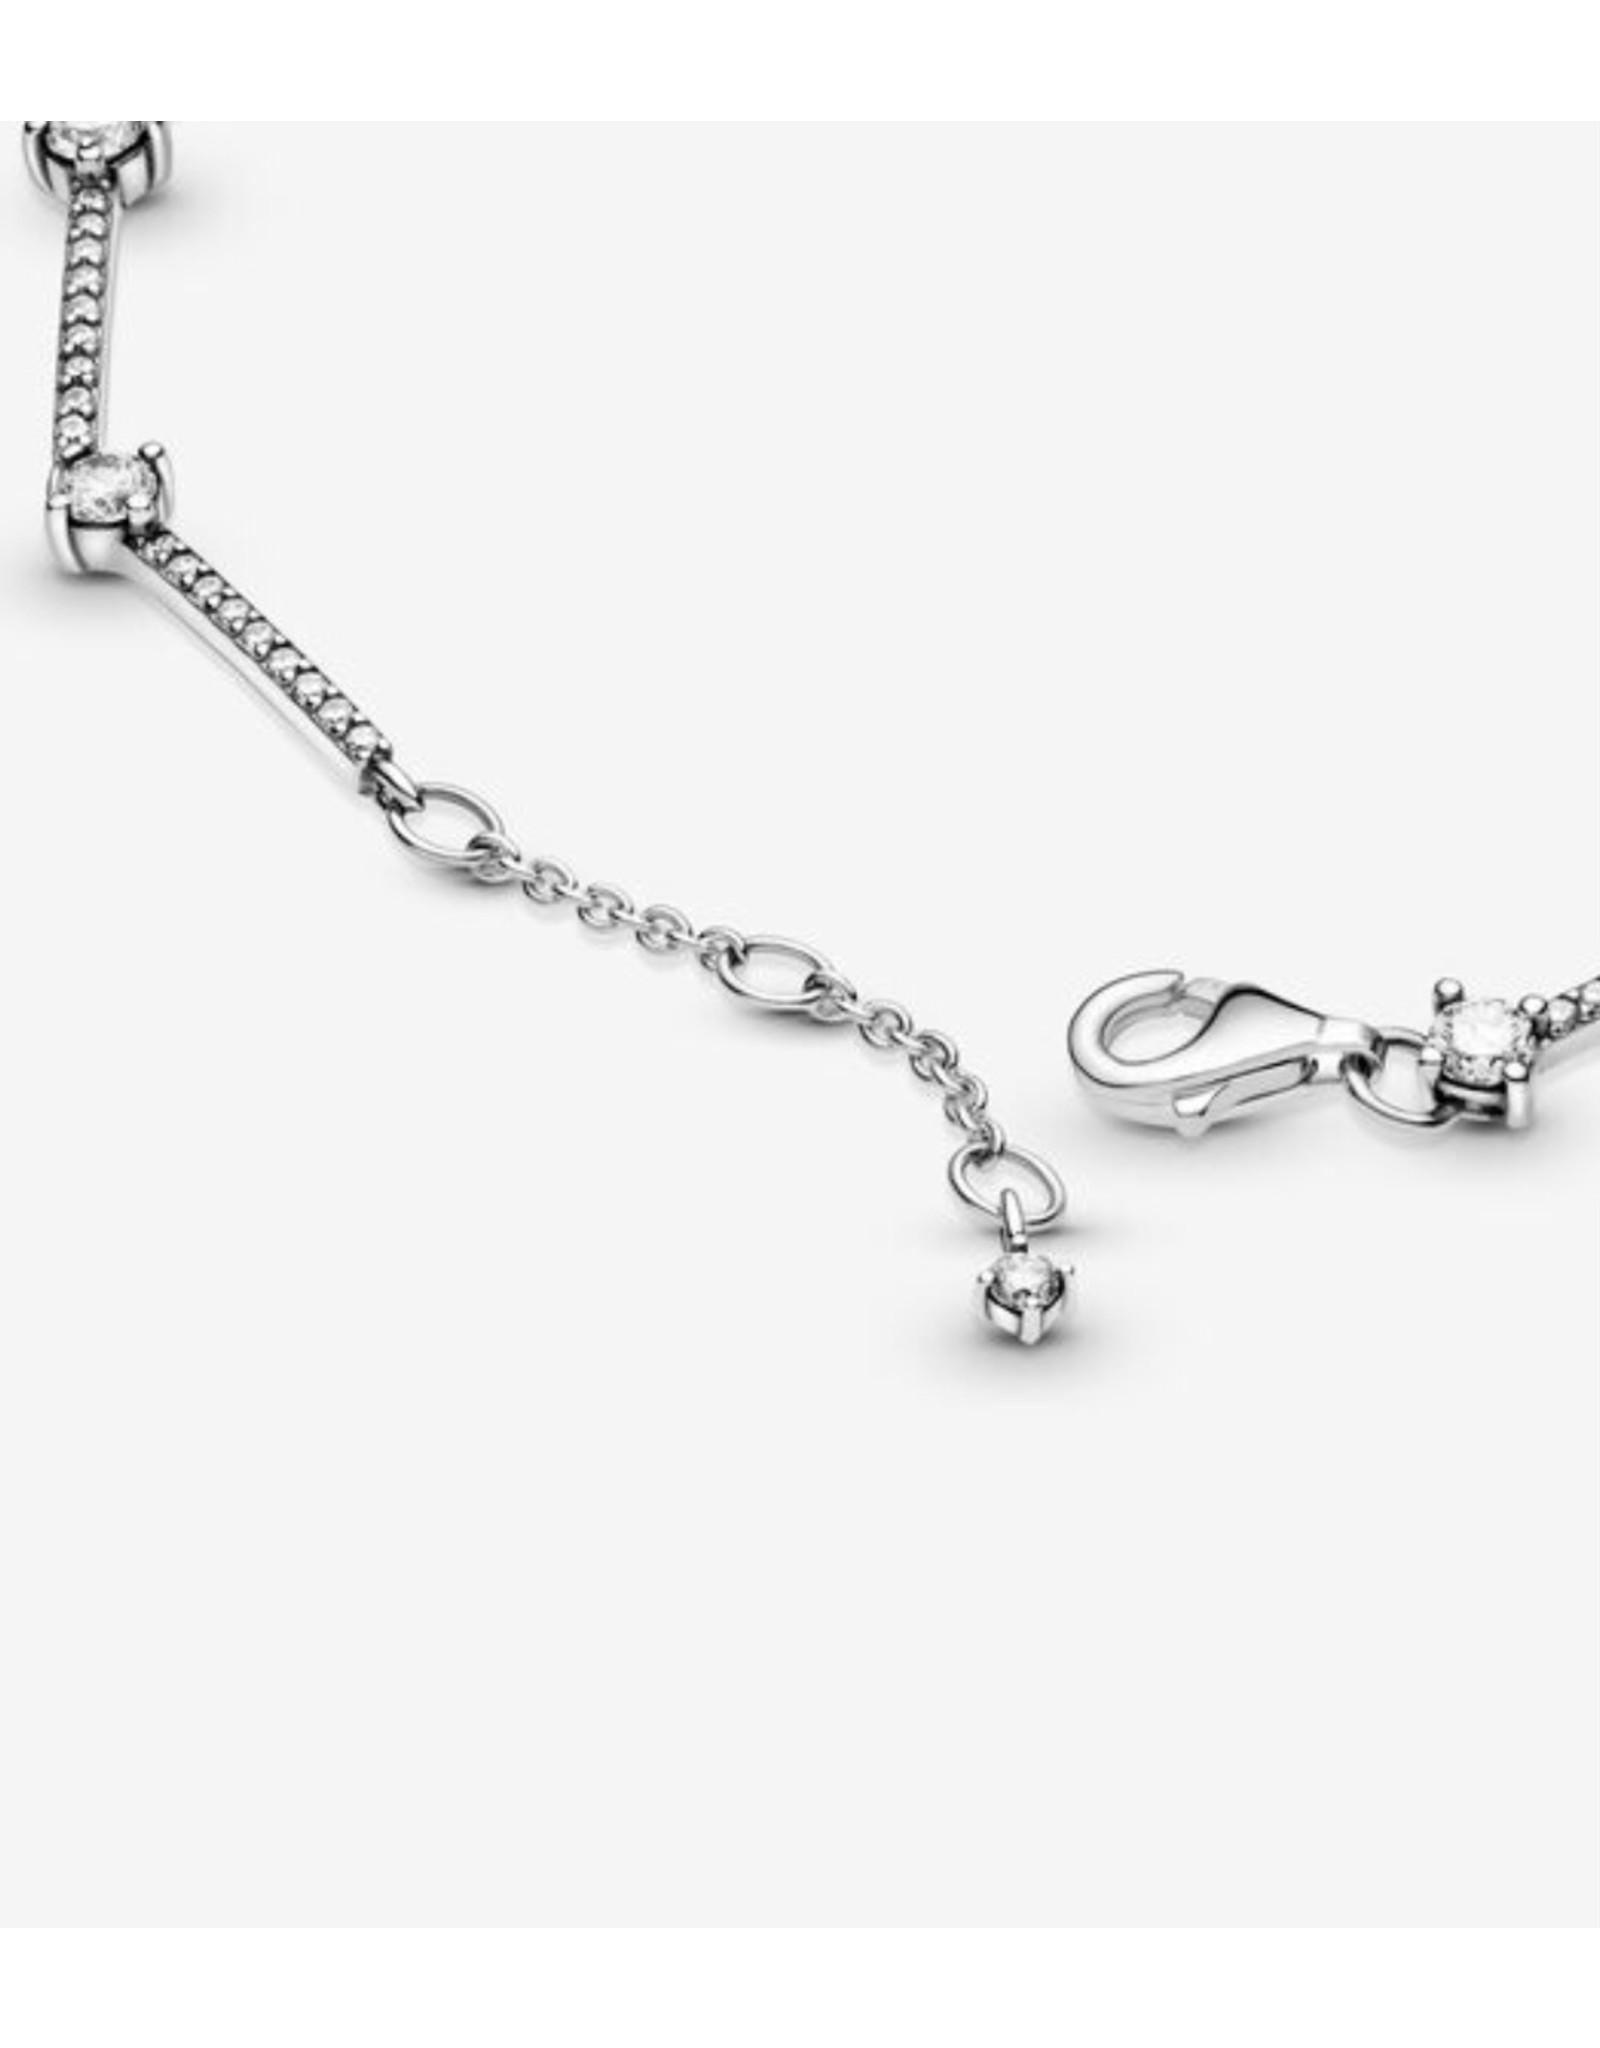 Pandora Pandora Bracelet, 599217C02,Sparkling Pave Bars,Sterling Silver, Clear CZ